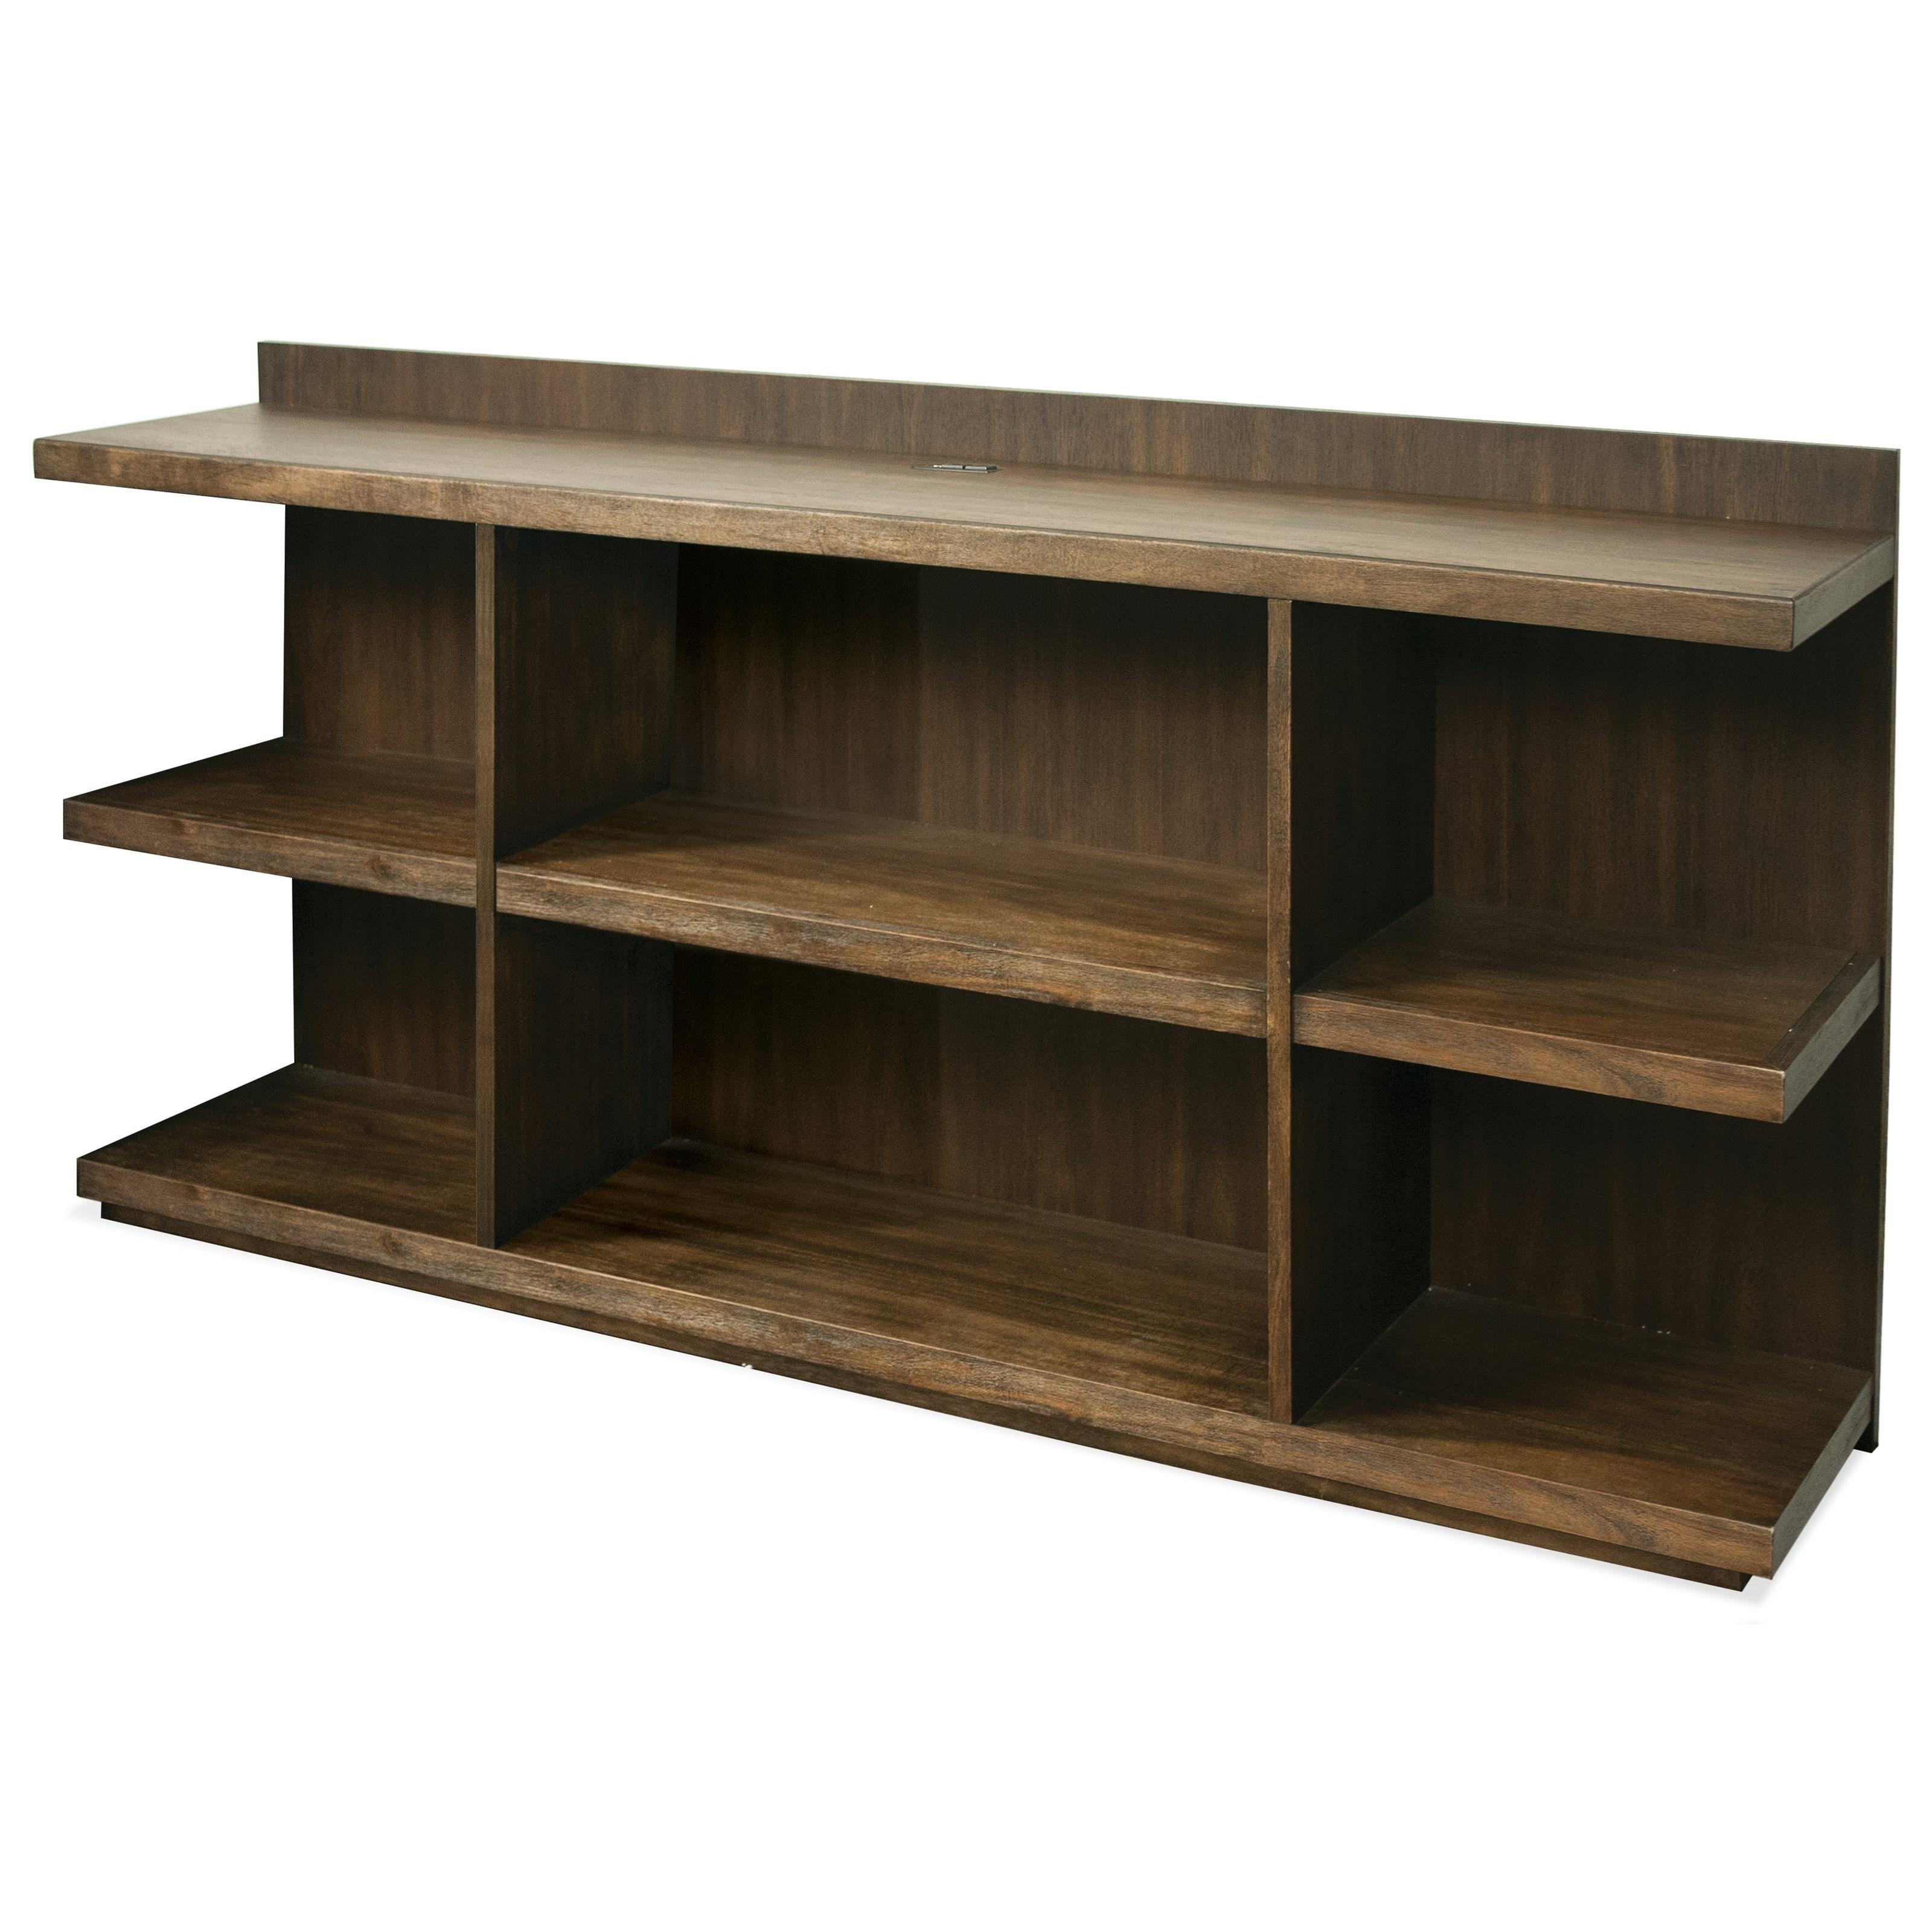 Perspectives Peninsula Bookcase Desk by Riverside Furniture at Mueller Furniture